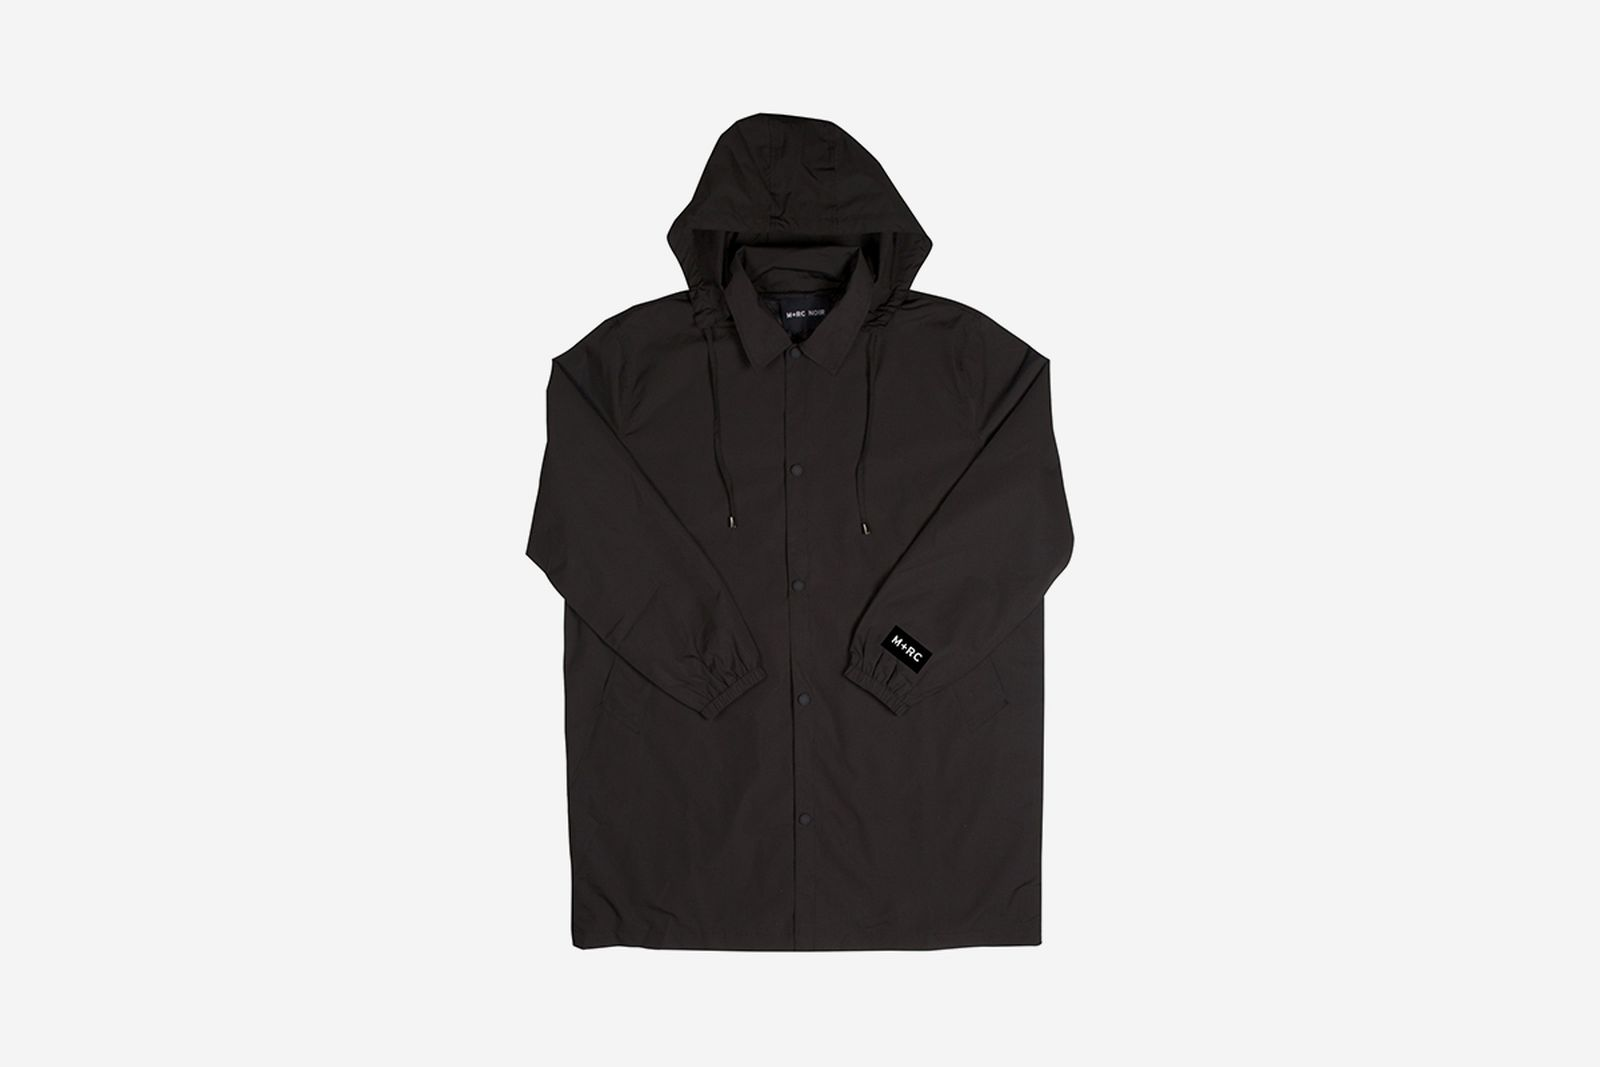 M RC NOIR overcoat front sleeve 2048x2048 M+RC NOIR SS18 playboi carti